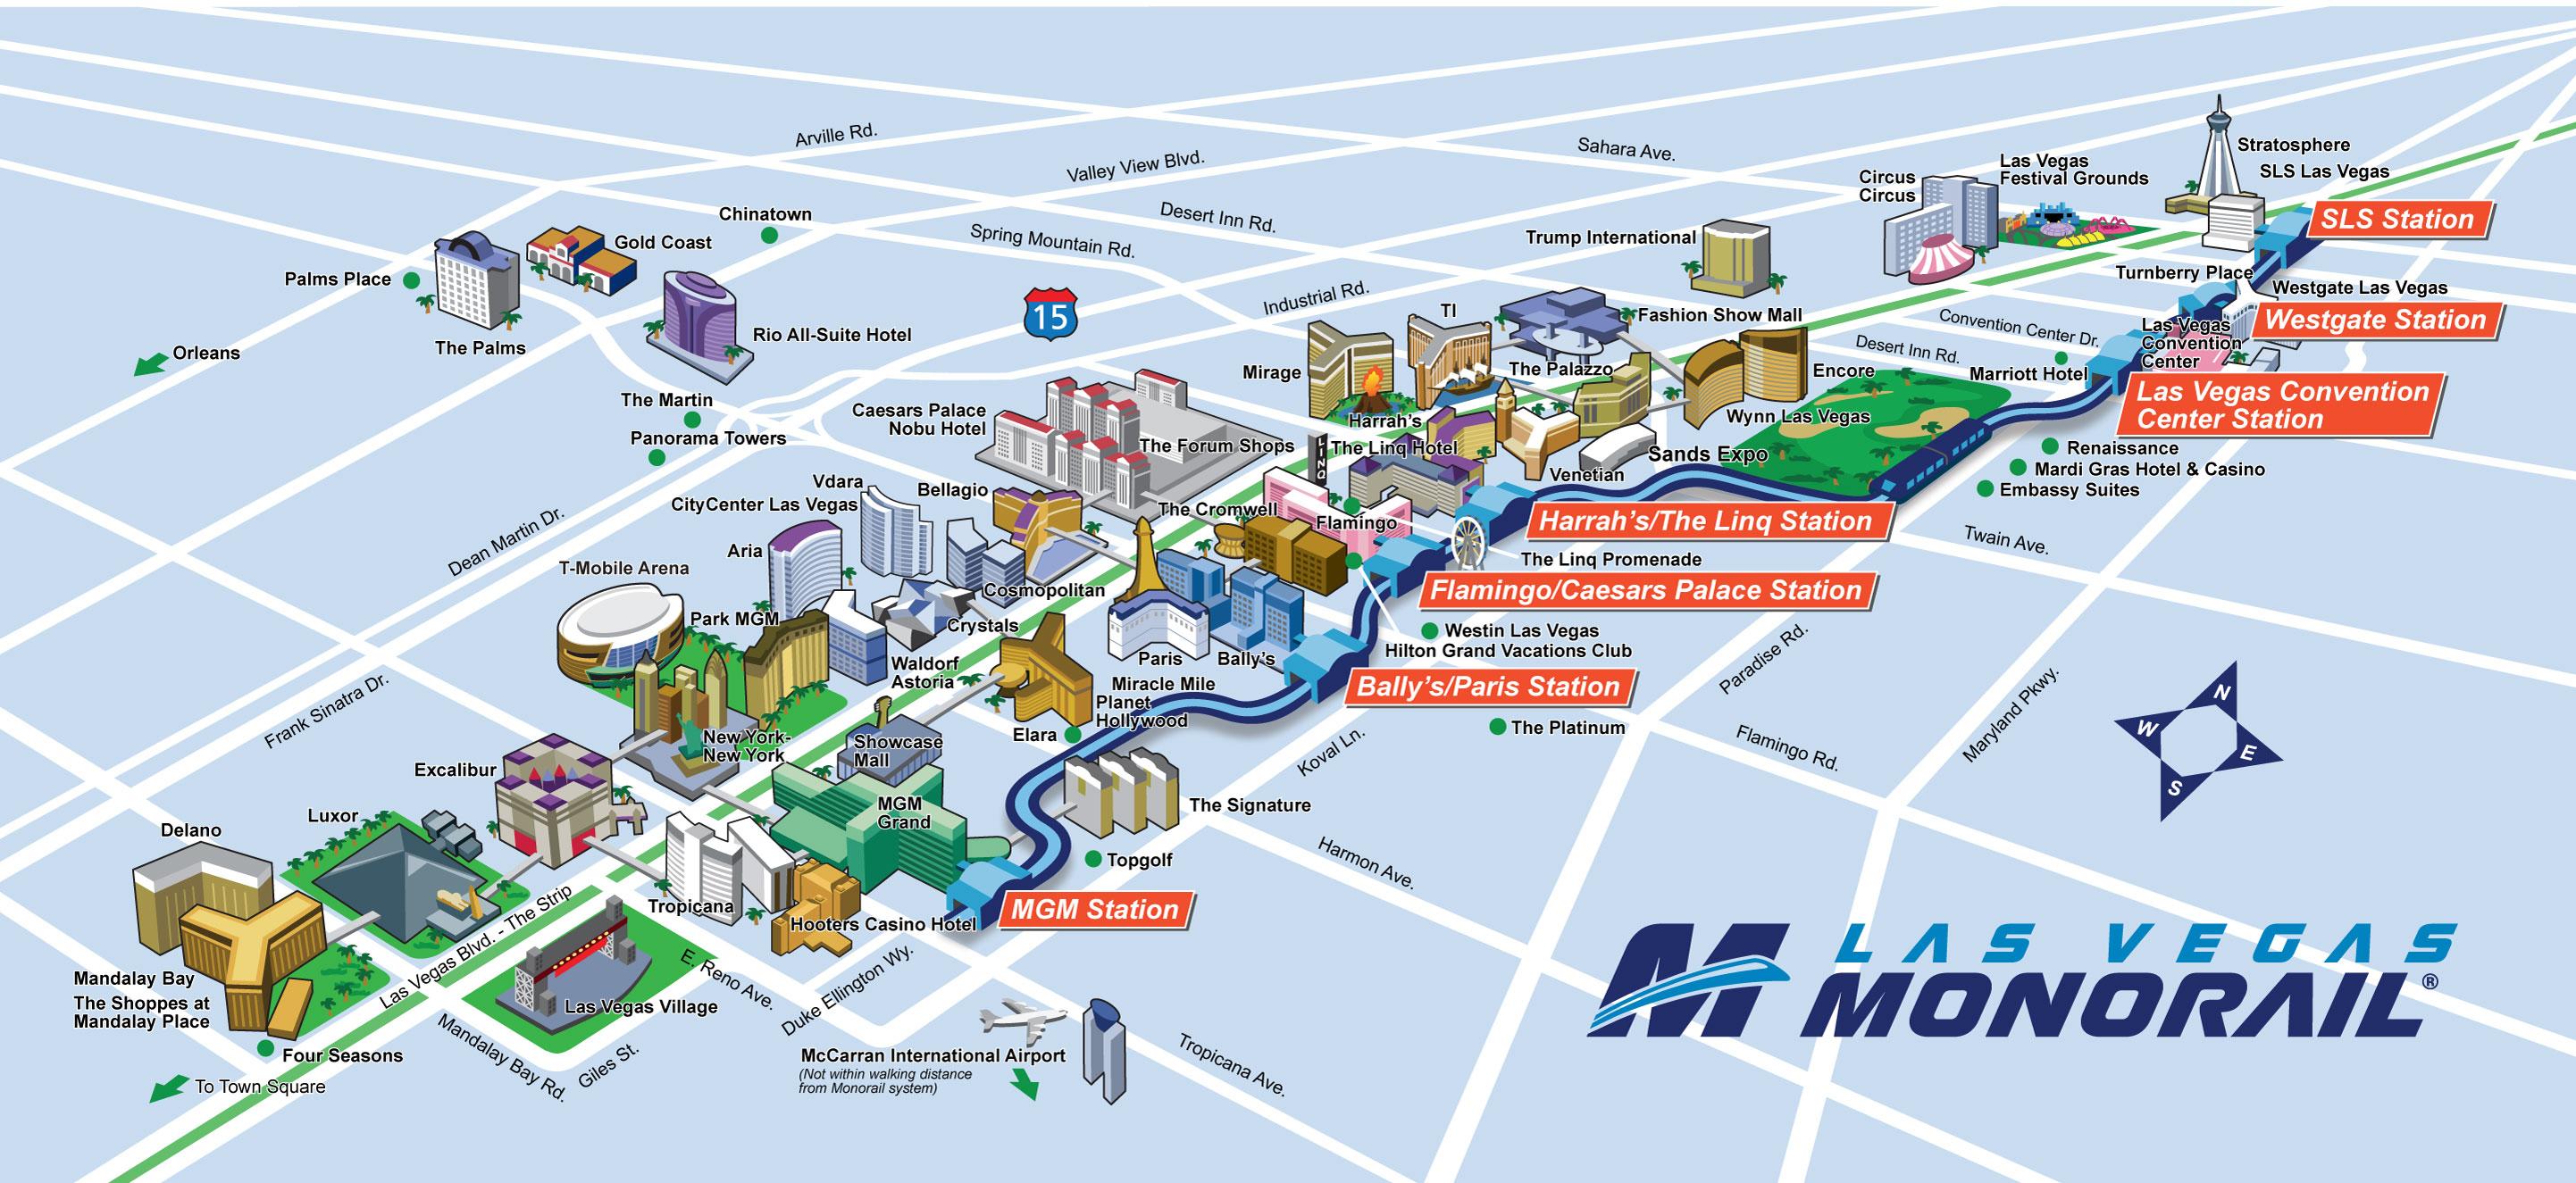 Route Map   Las Vegas Monorail - Printable Map Of Las Vegas Strip 2018